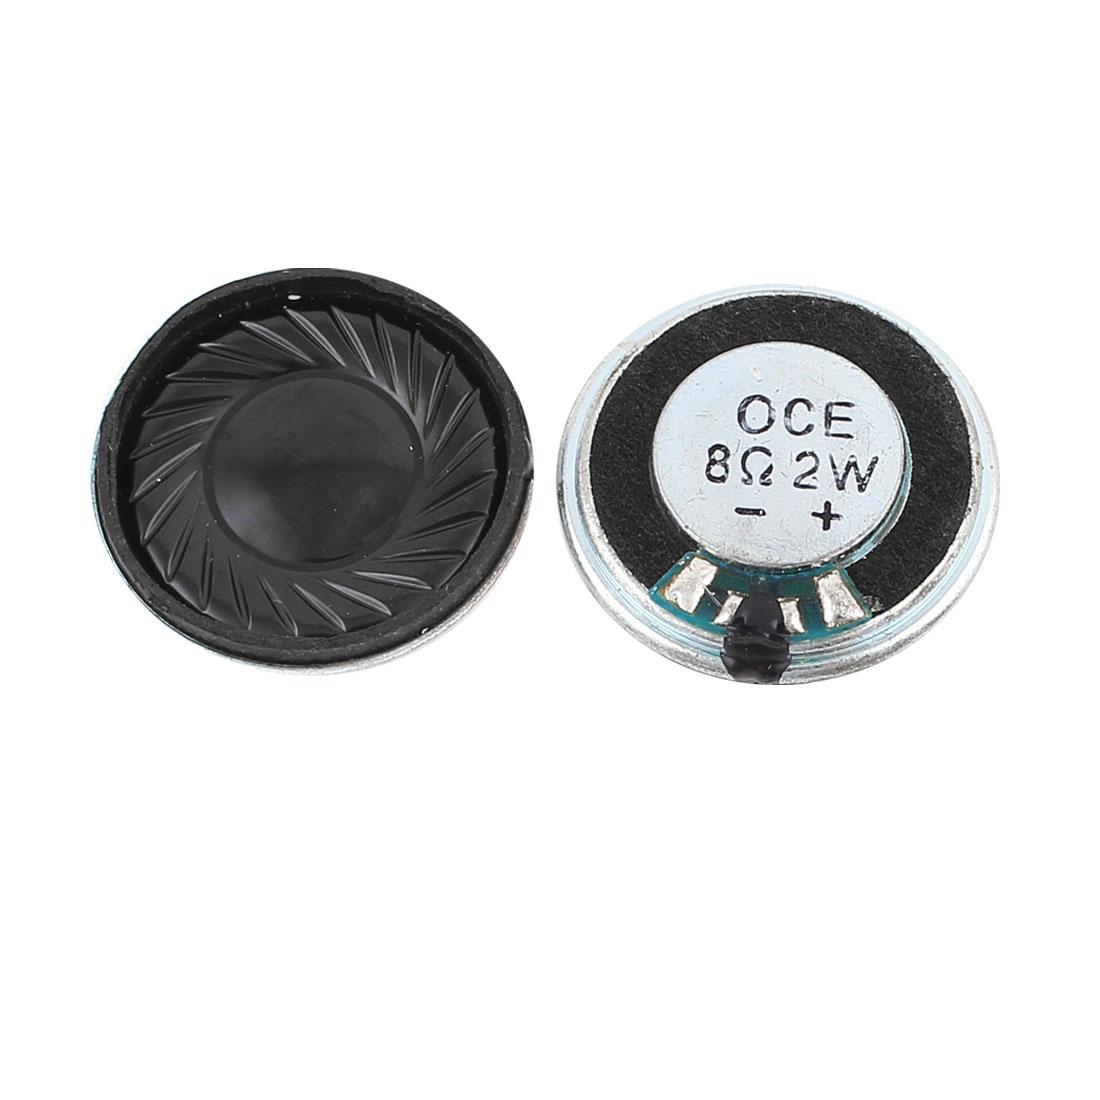 2 Pcs 2W 8 Ohm 29mm Round Inside Magnet Electronic Speaker Loudspeaker